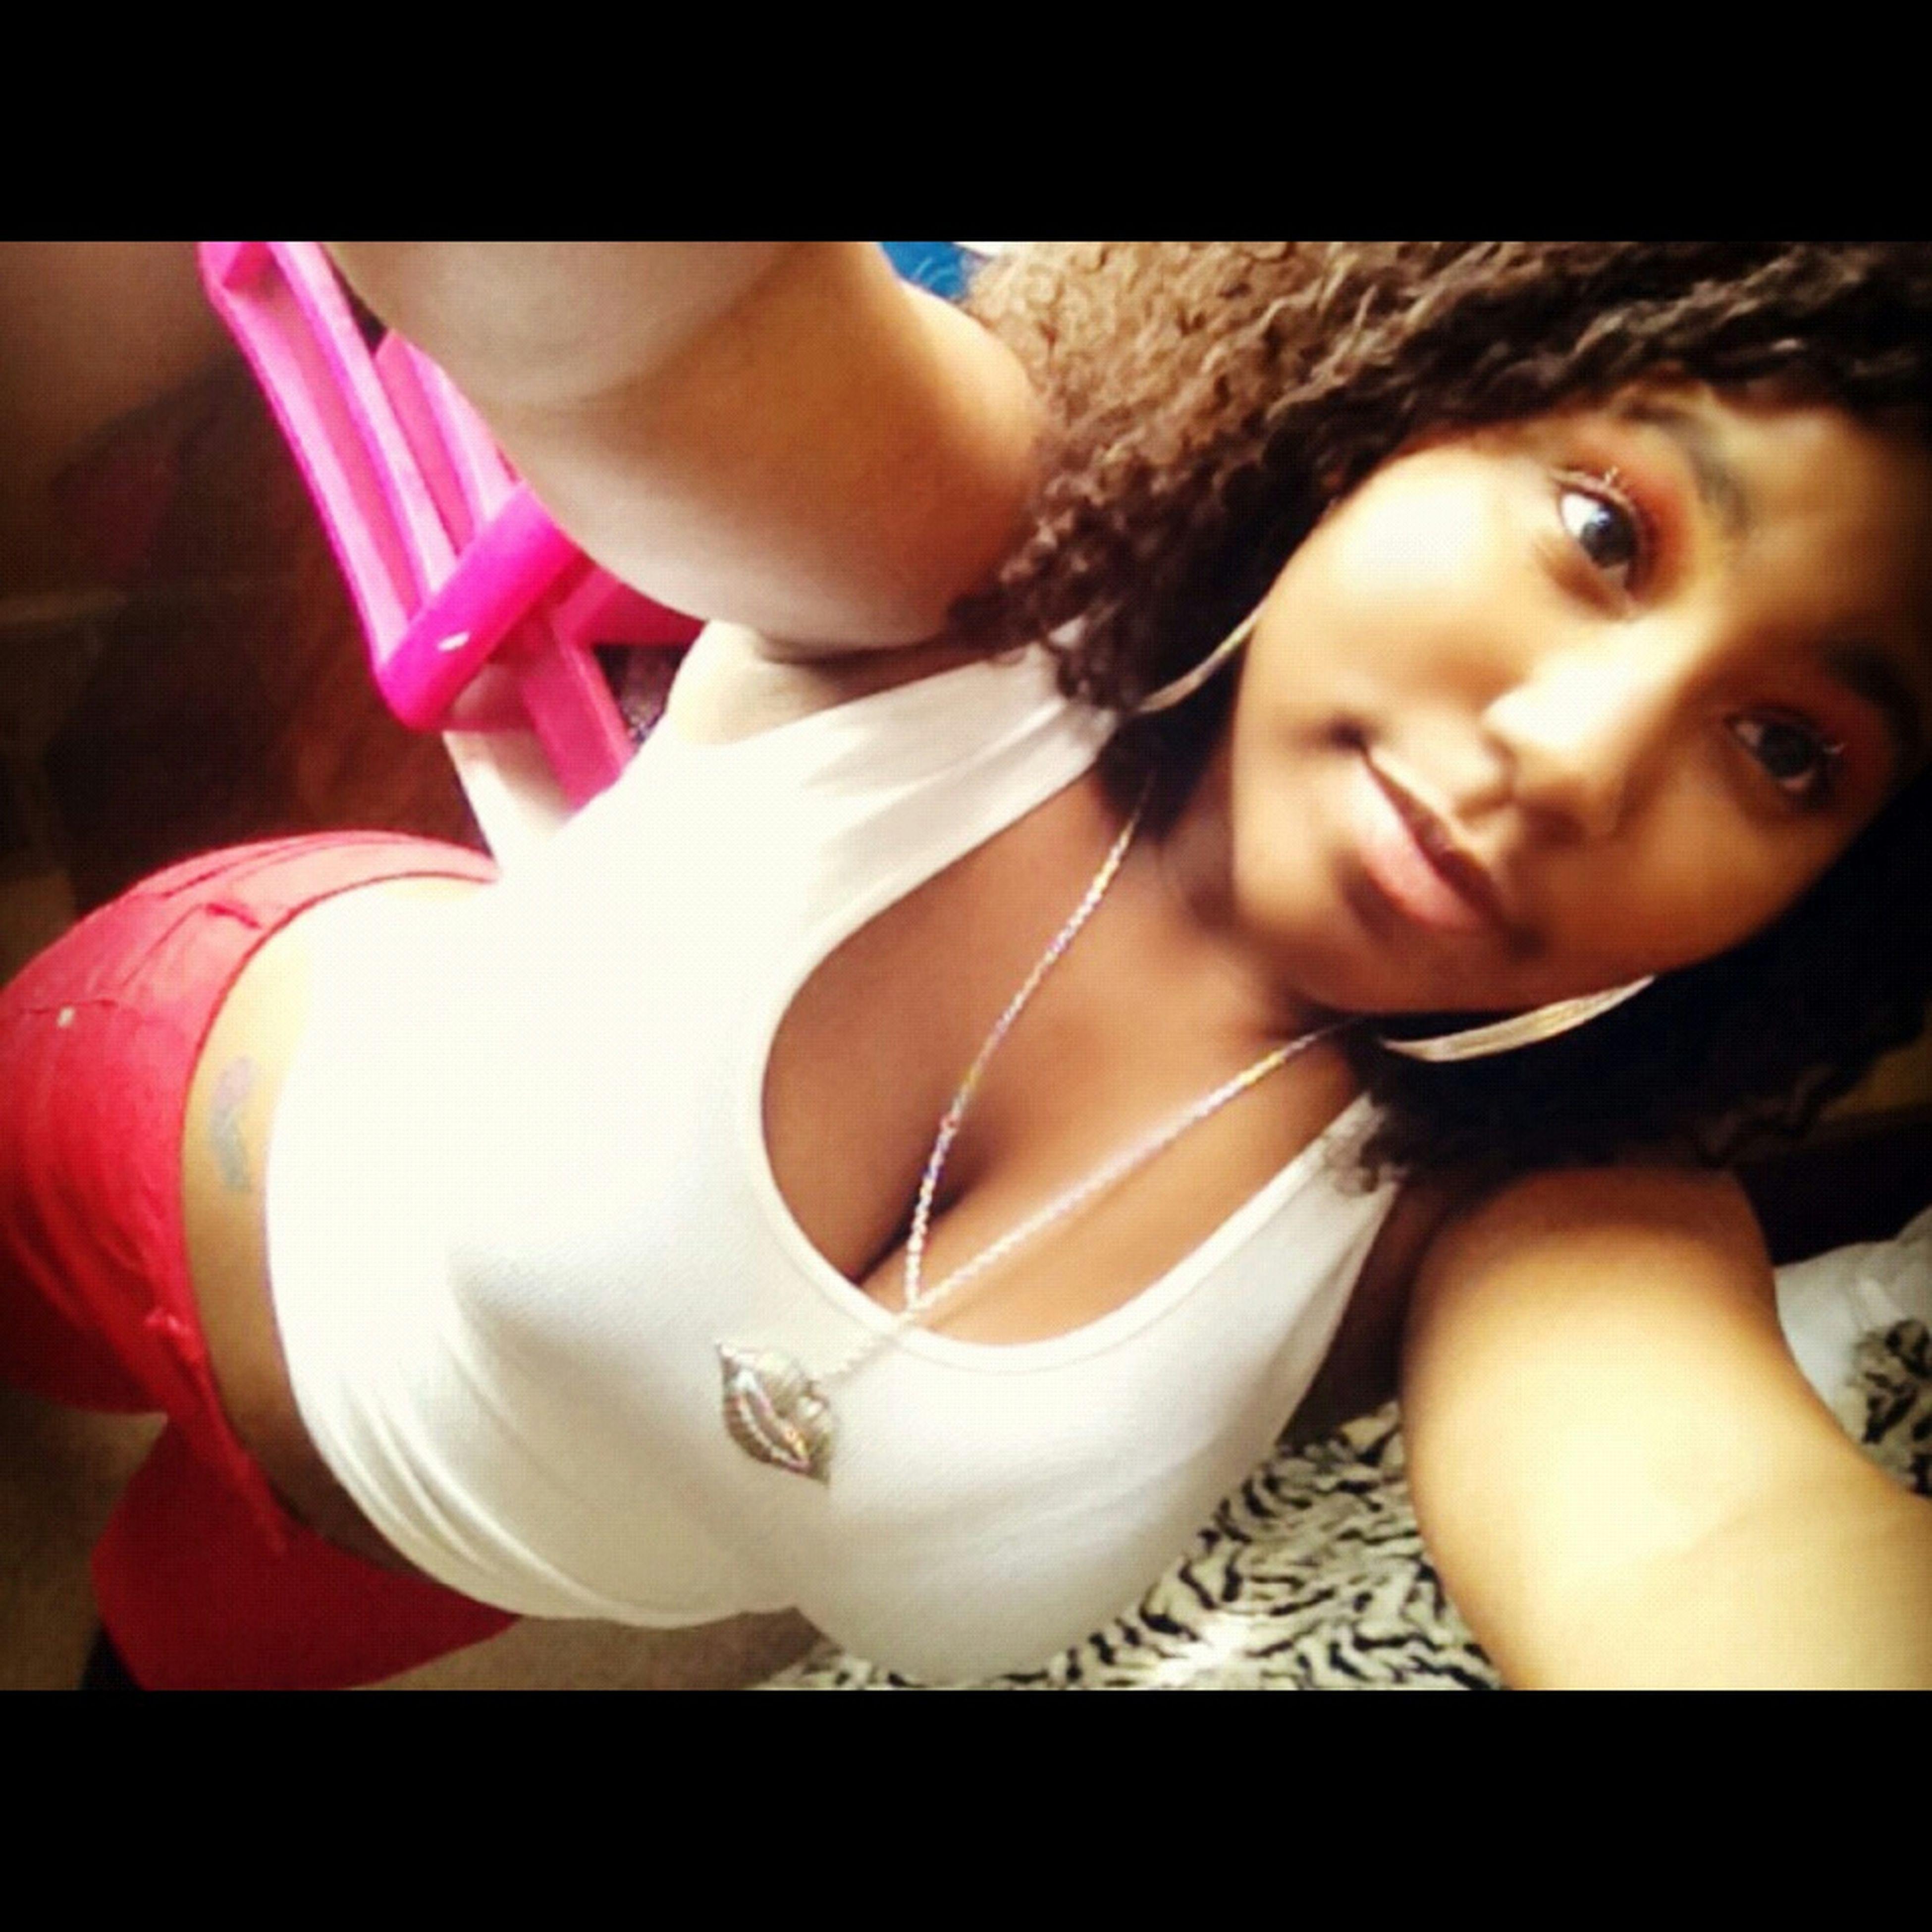 -Follow A Pretty Bitch :)